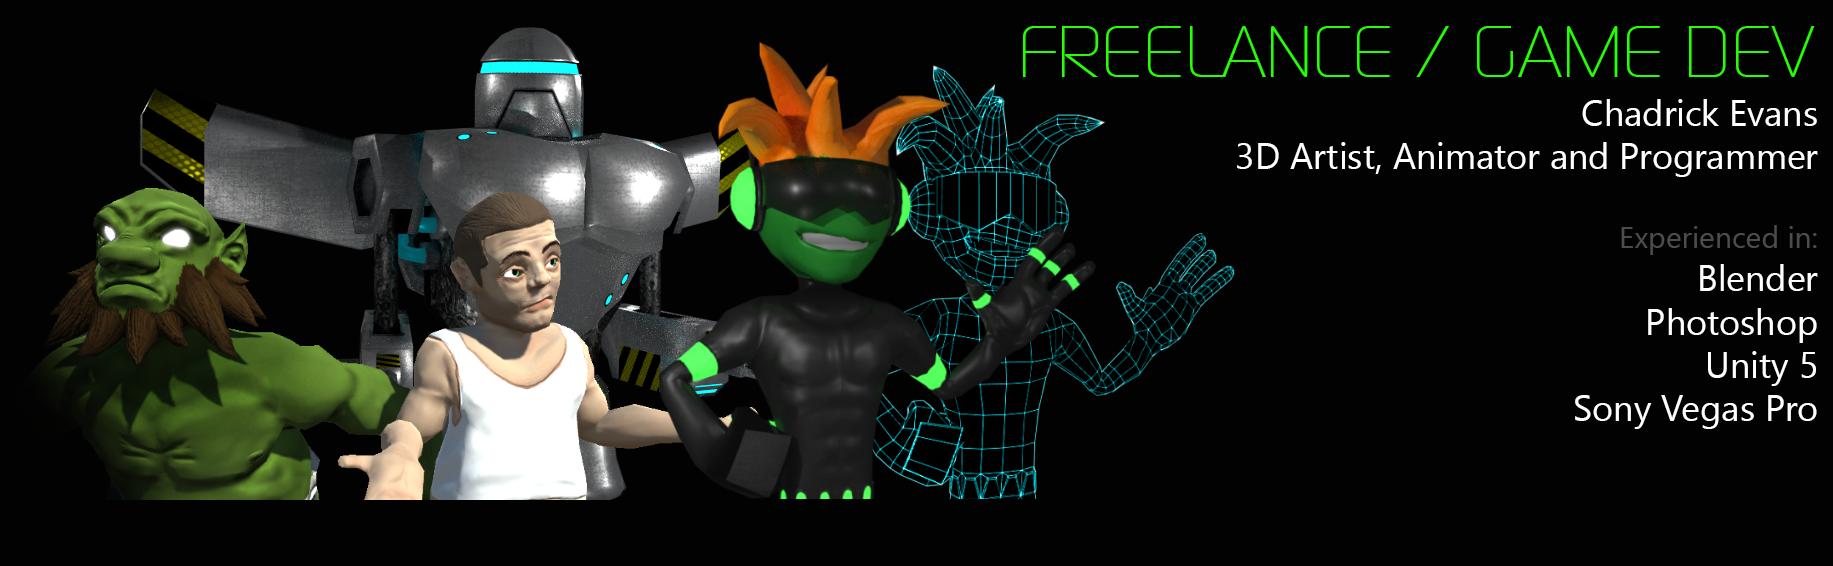 3D Alien Mascot Model